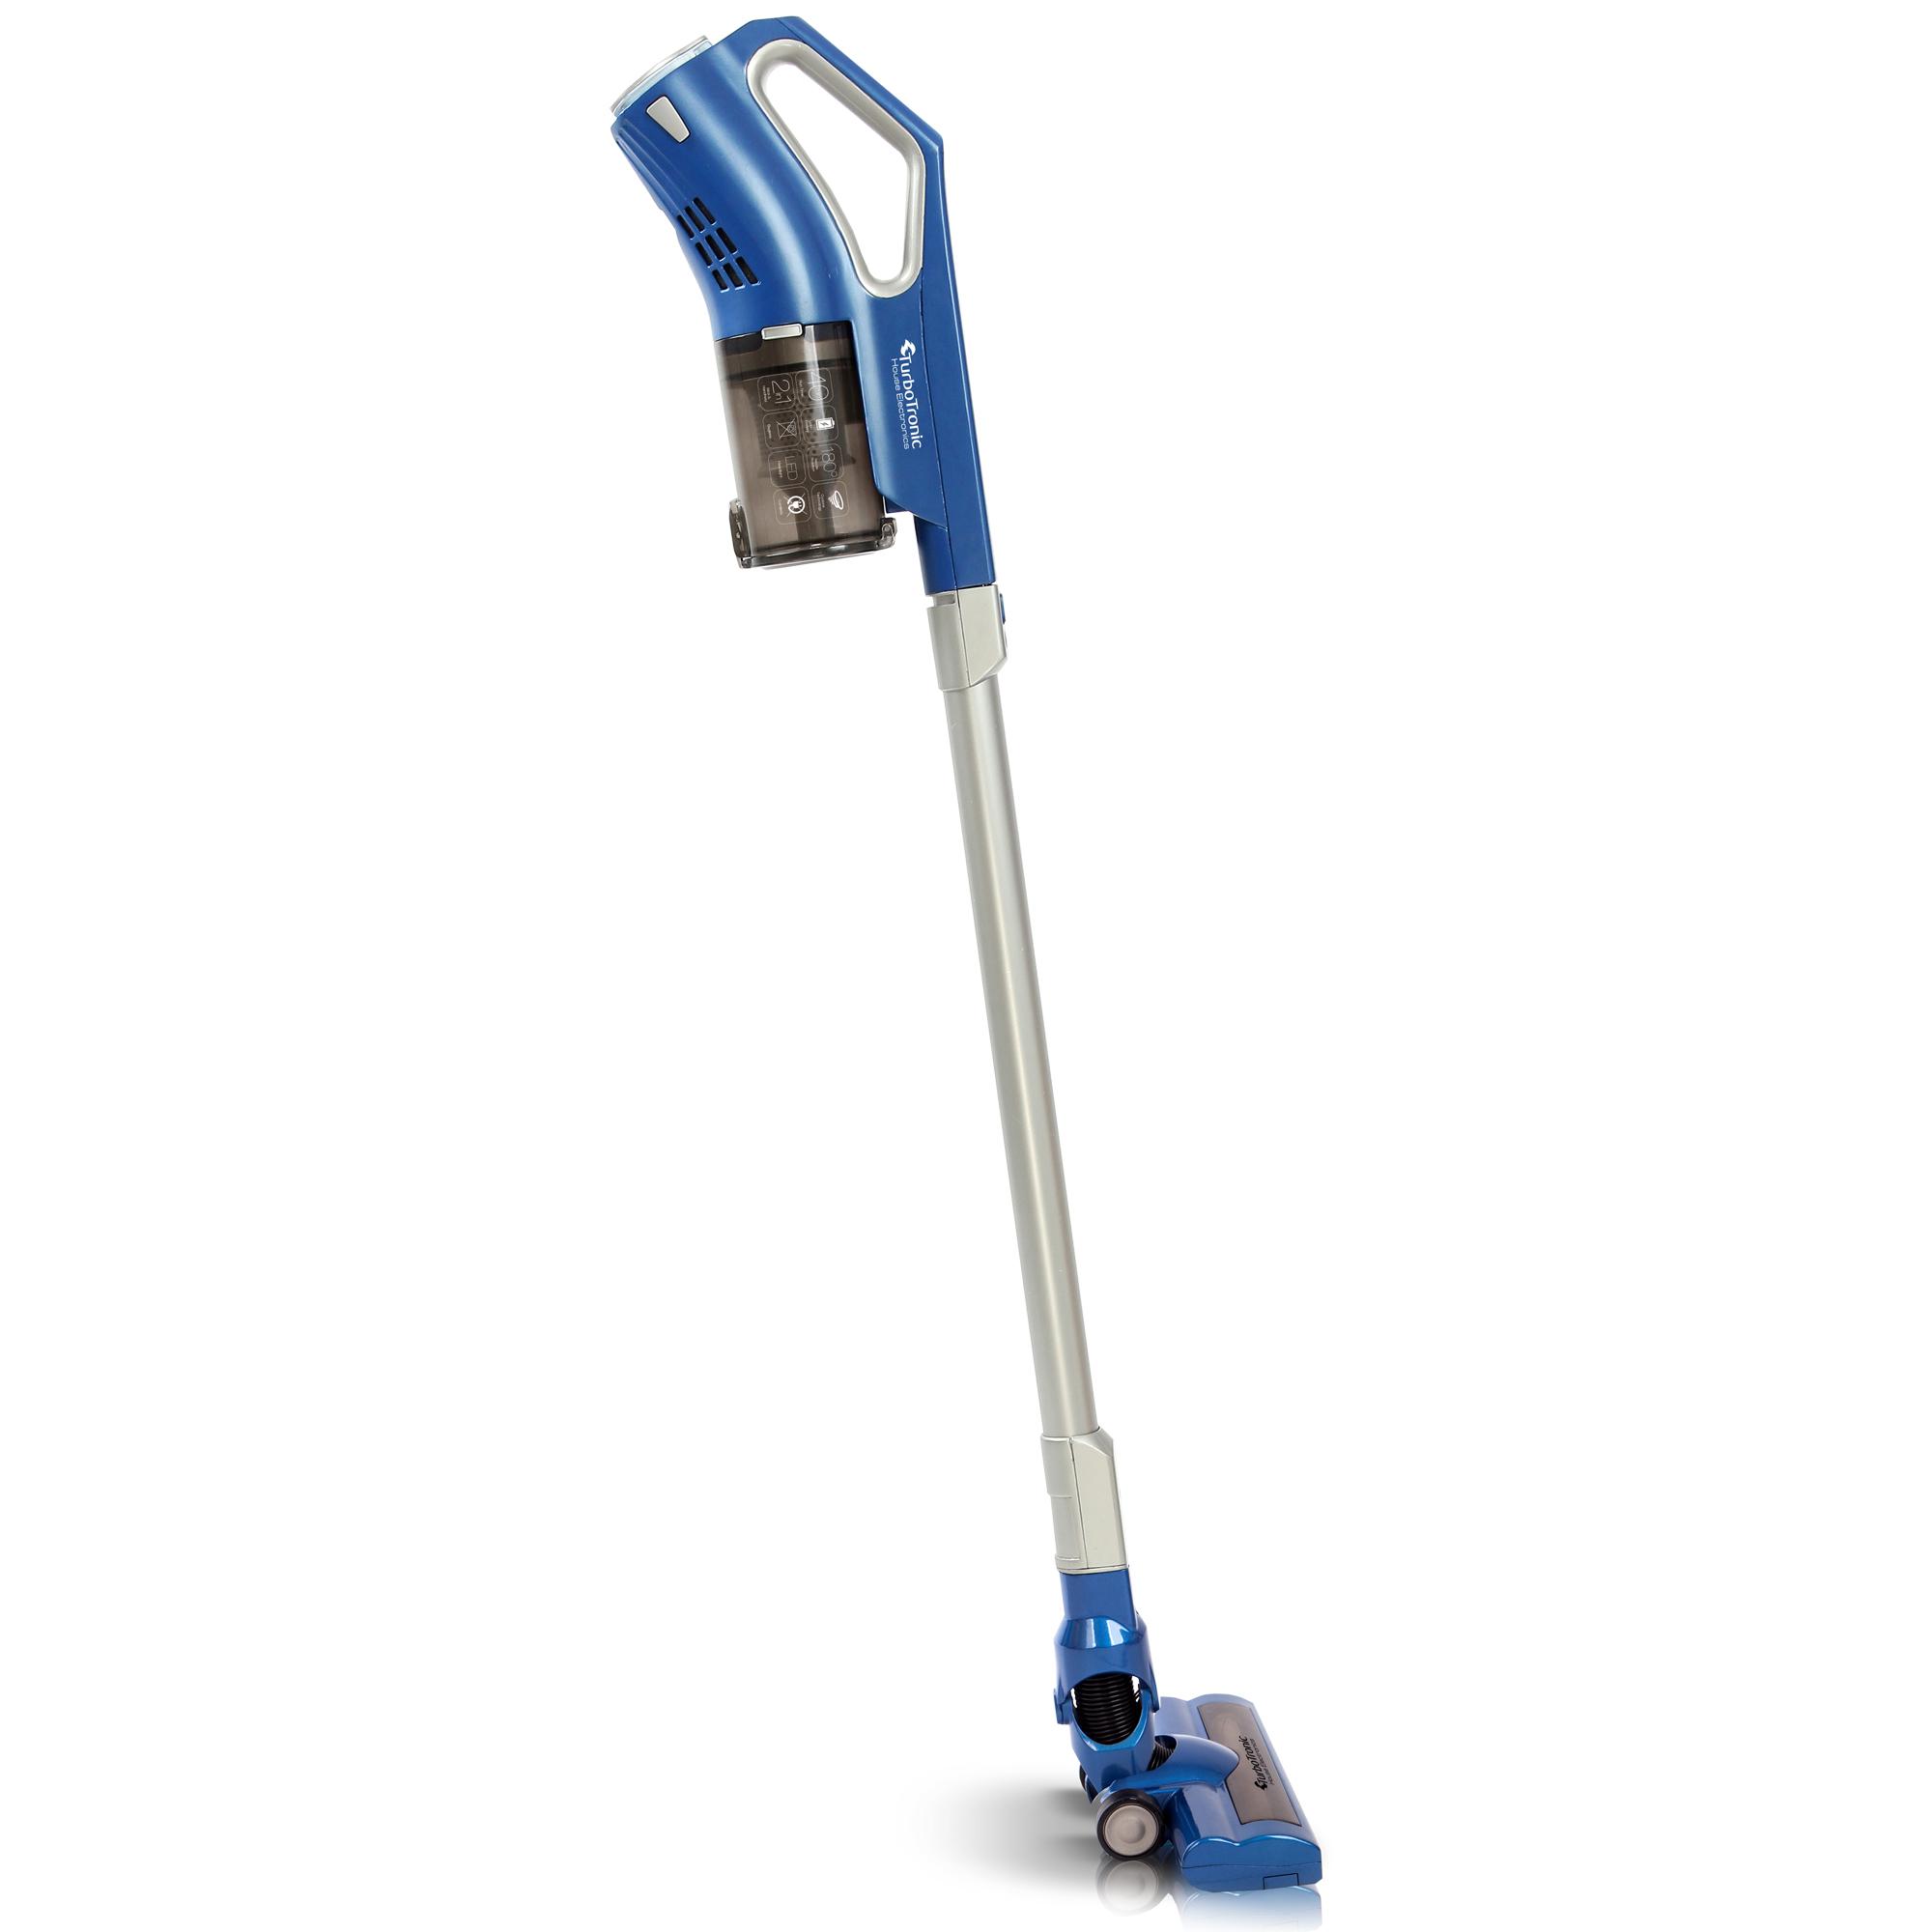 Cyclonic Vacuum Stick Tt Vs280 Zline World Turbotronic